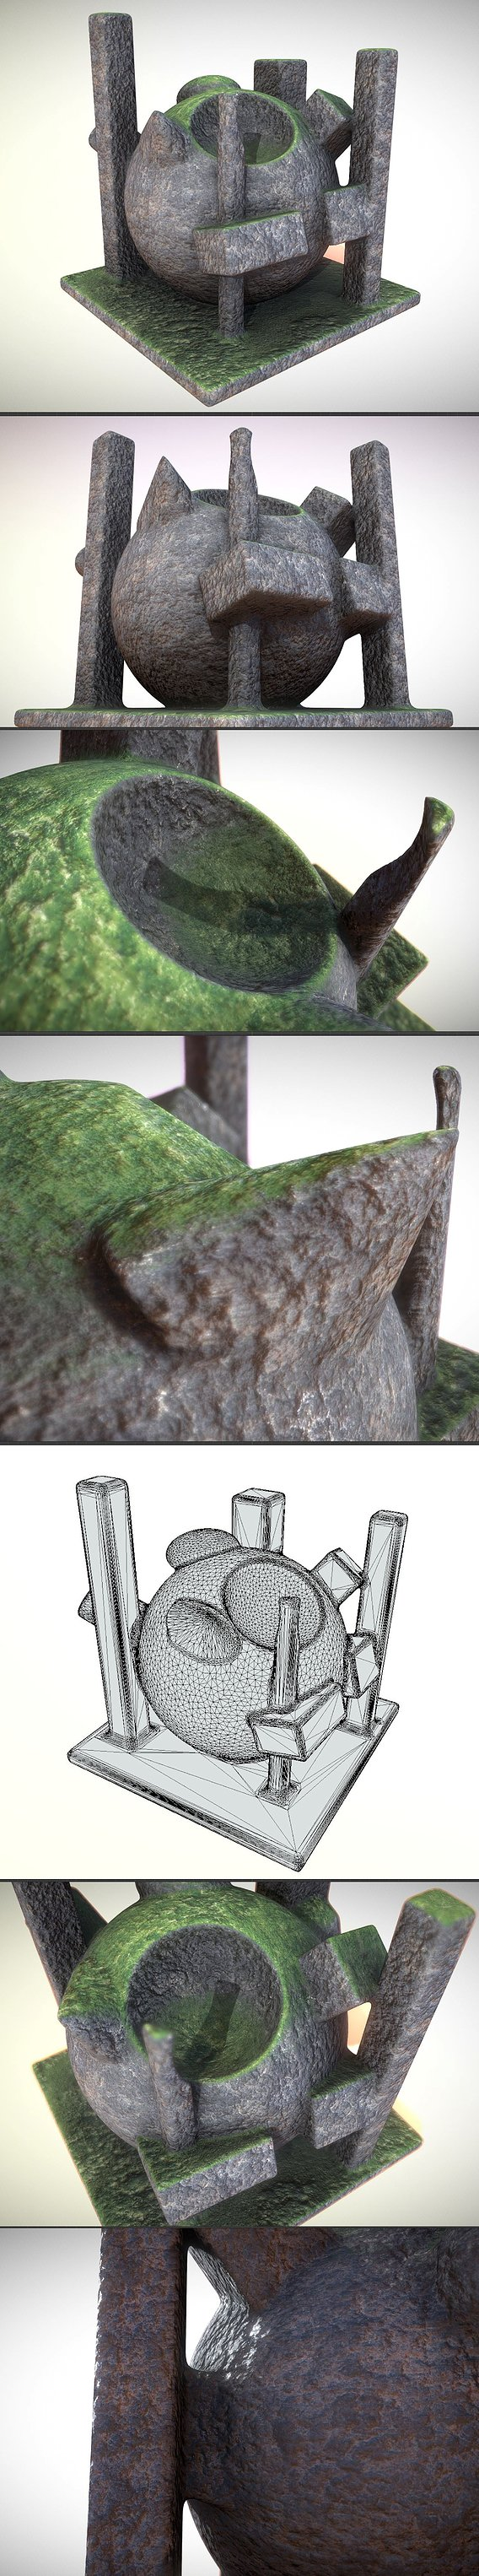 Moss on Rock (Baked Textur Test) Blender-2.92